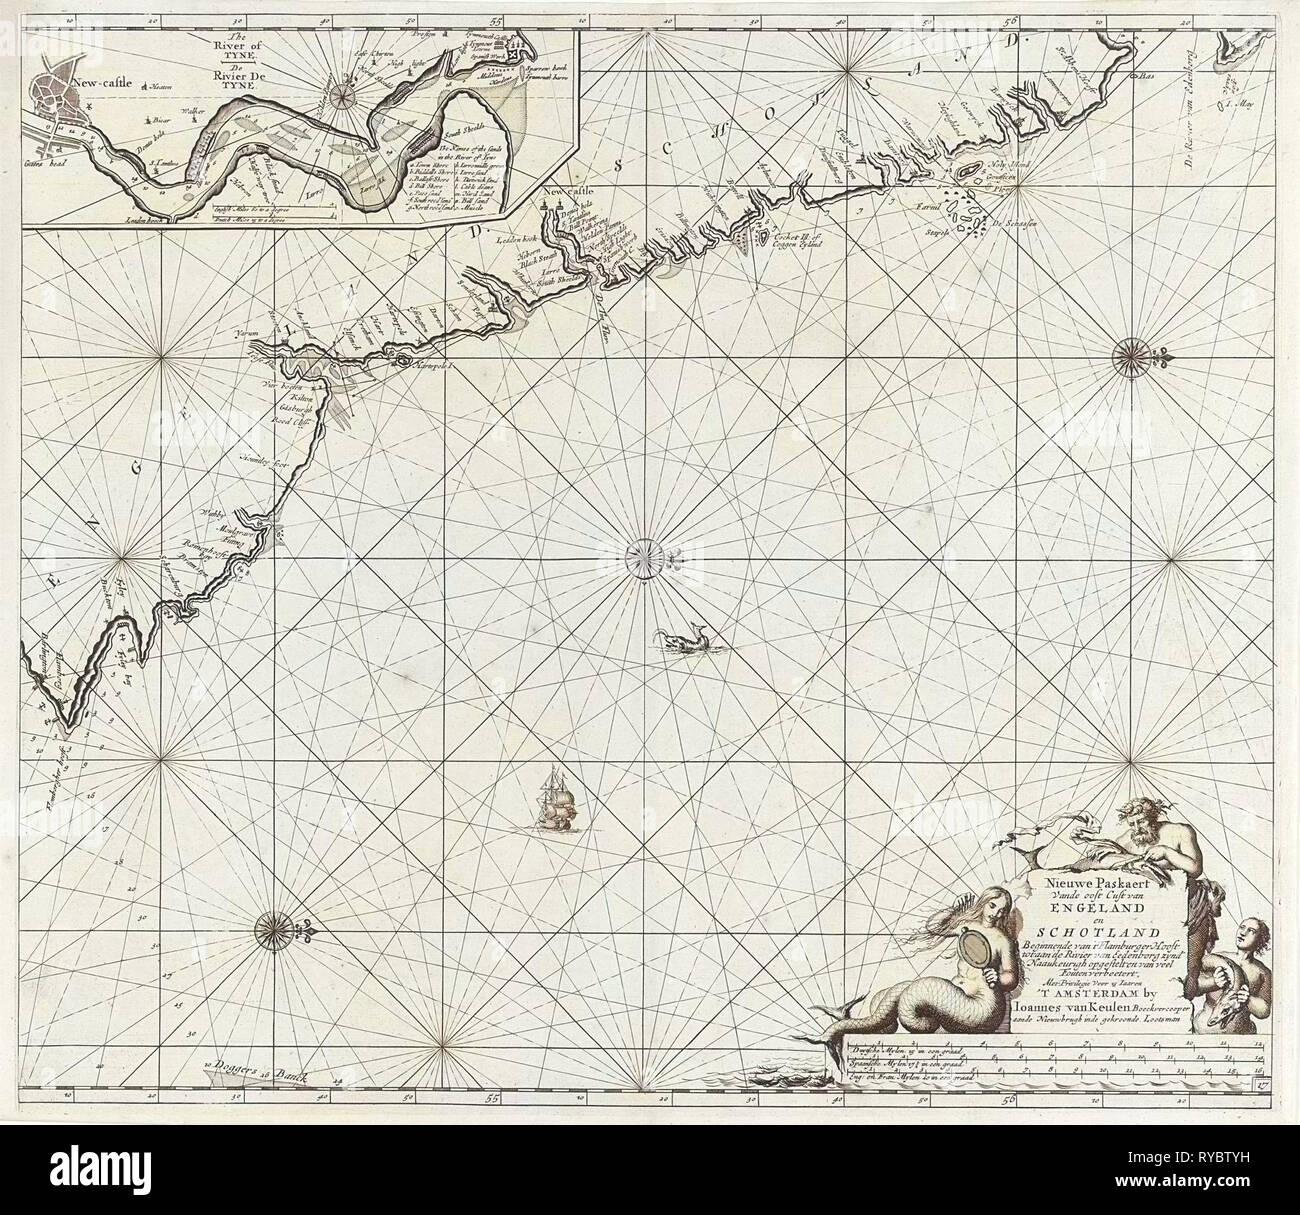 Sea chart of part of the northeast coast of England and part of Scotland, Jan Luyken, Johannes van Keulen (I), unknown, 1681 - 1799 - Stock Image